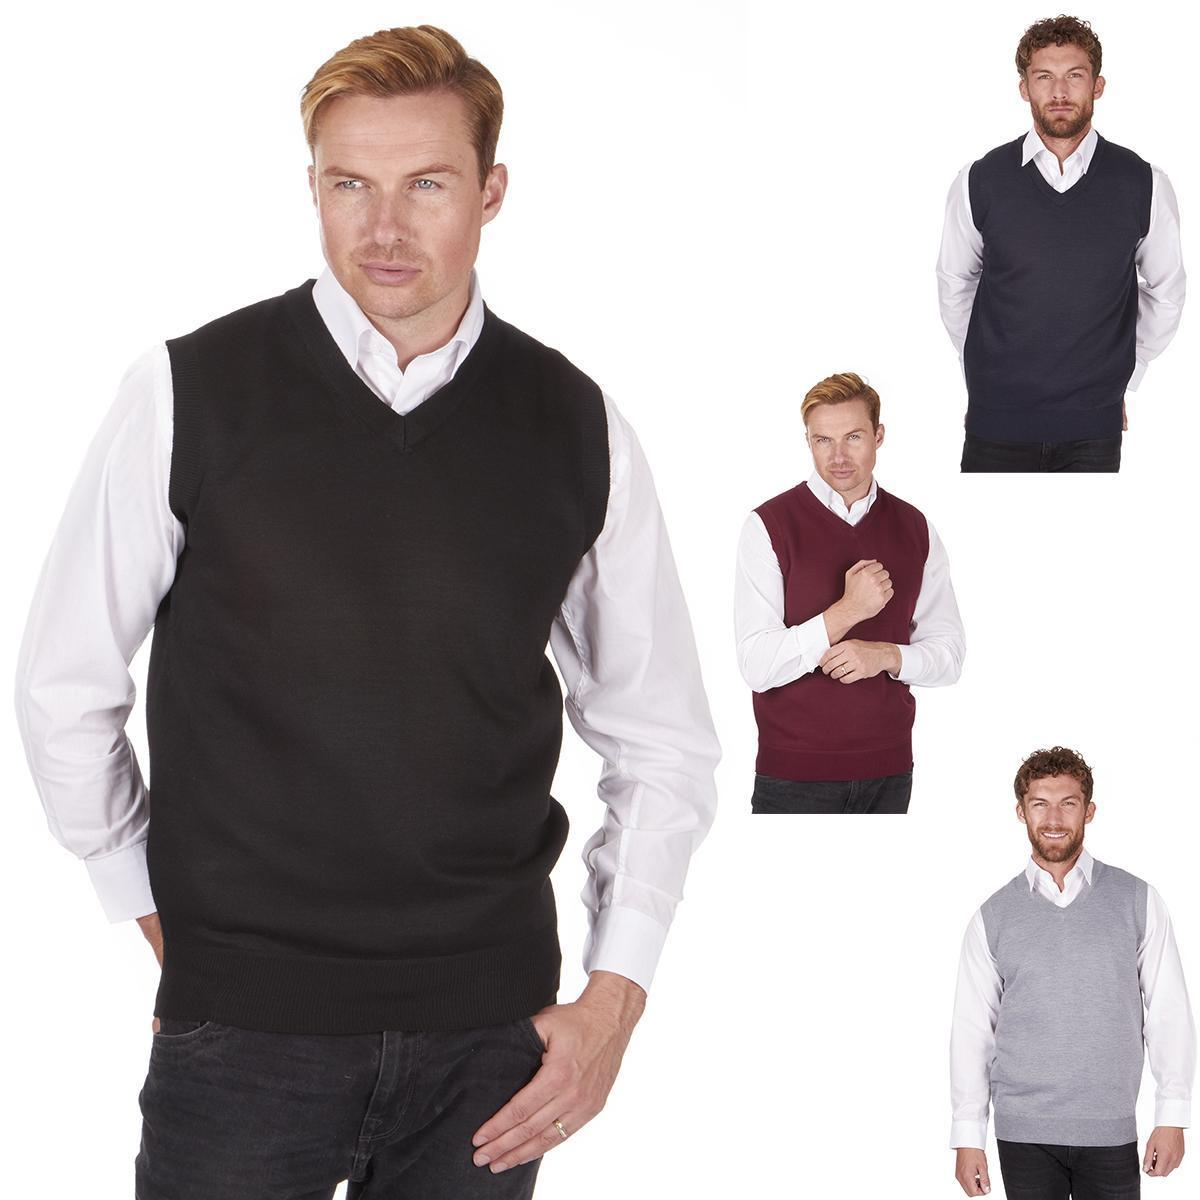 Pierre Roche Mens Sleeveless Knitted Tank Top Smart Casual Jumper Gift Regular